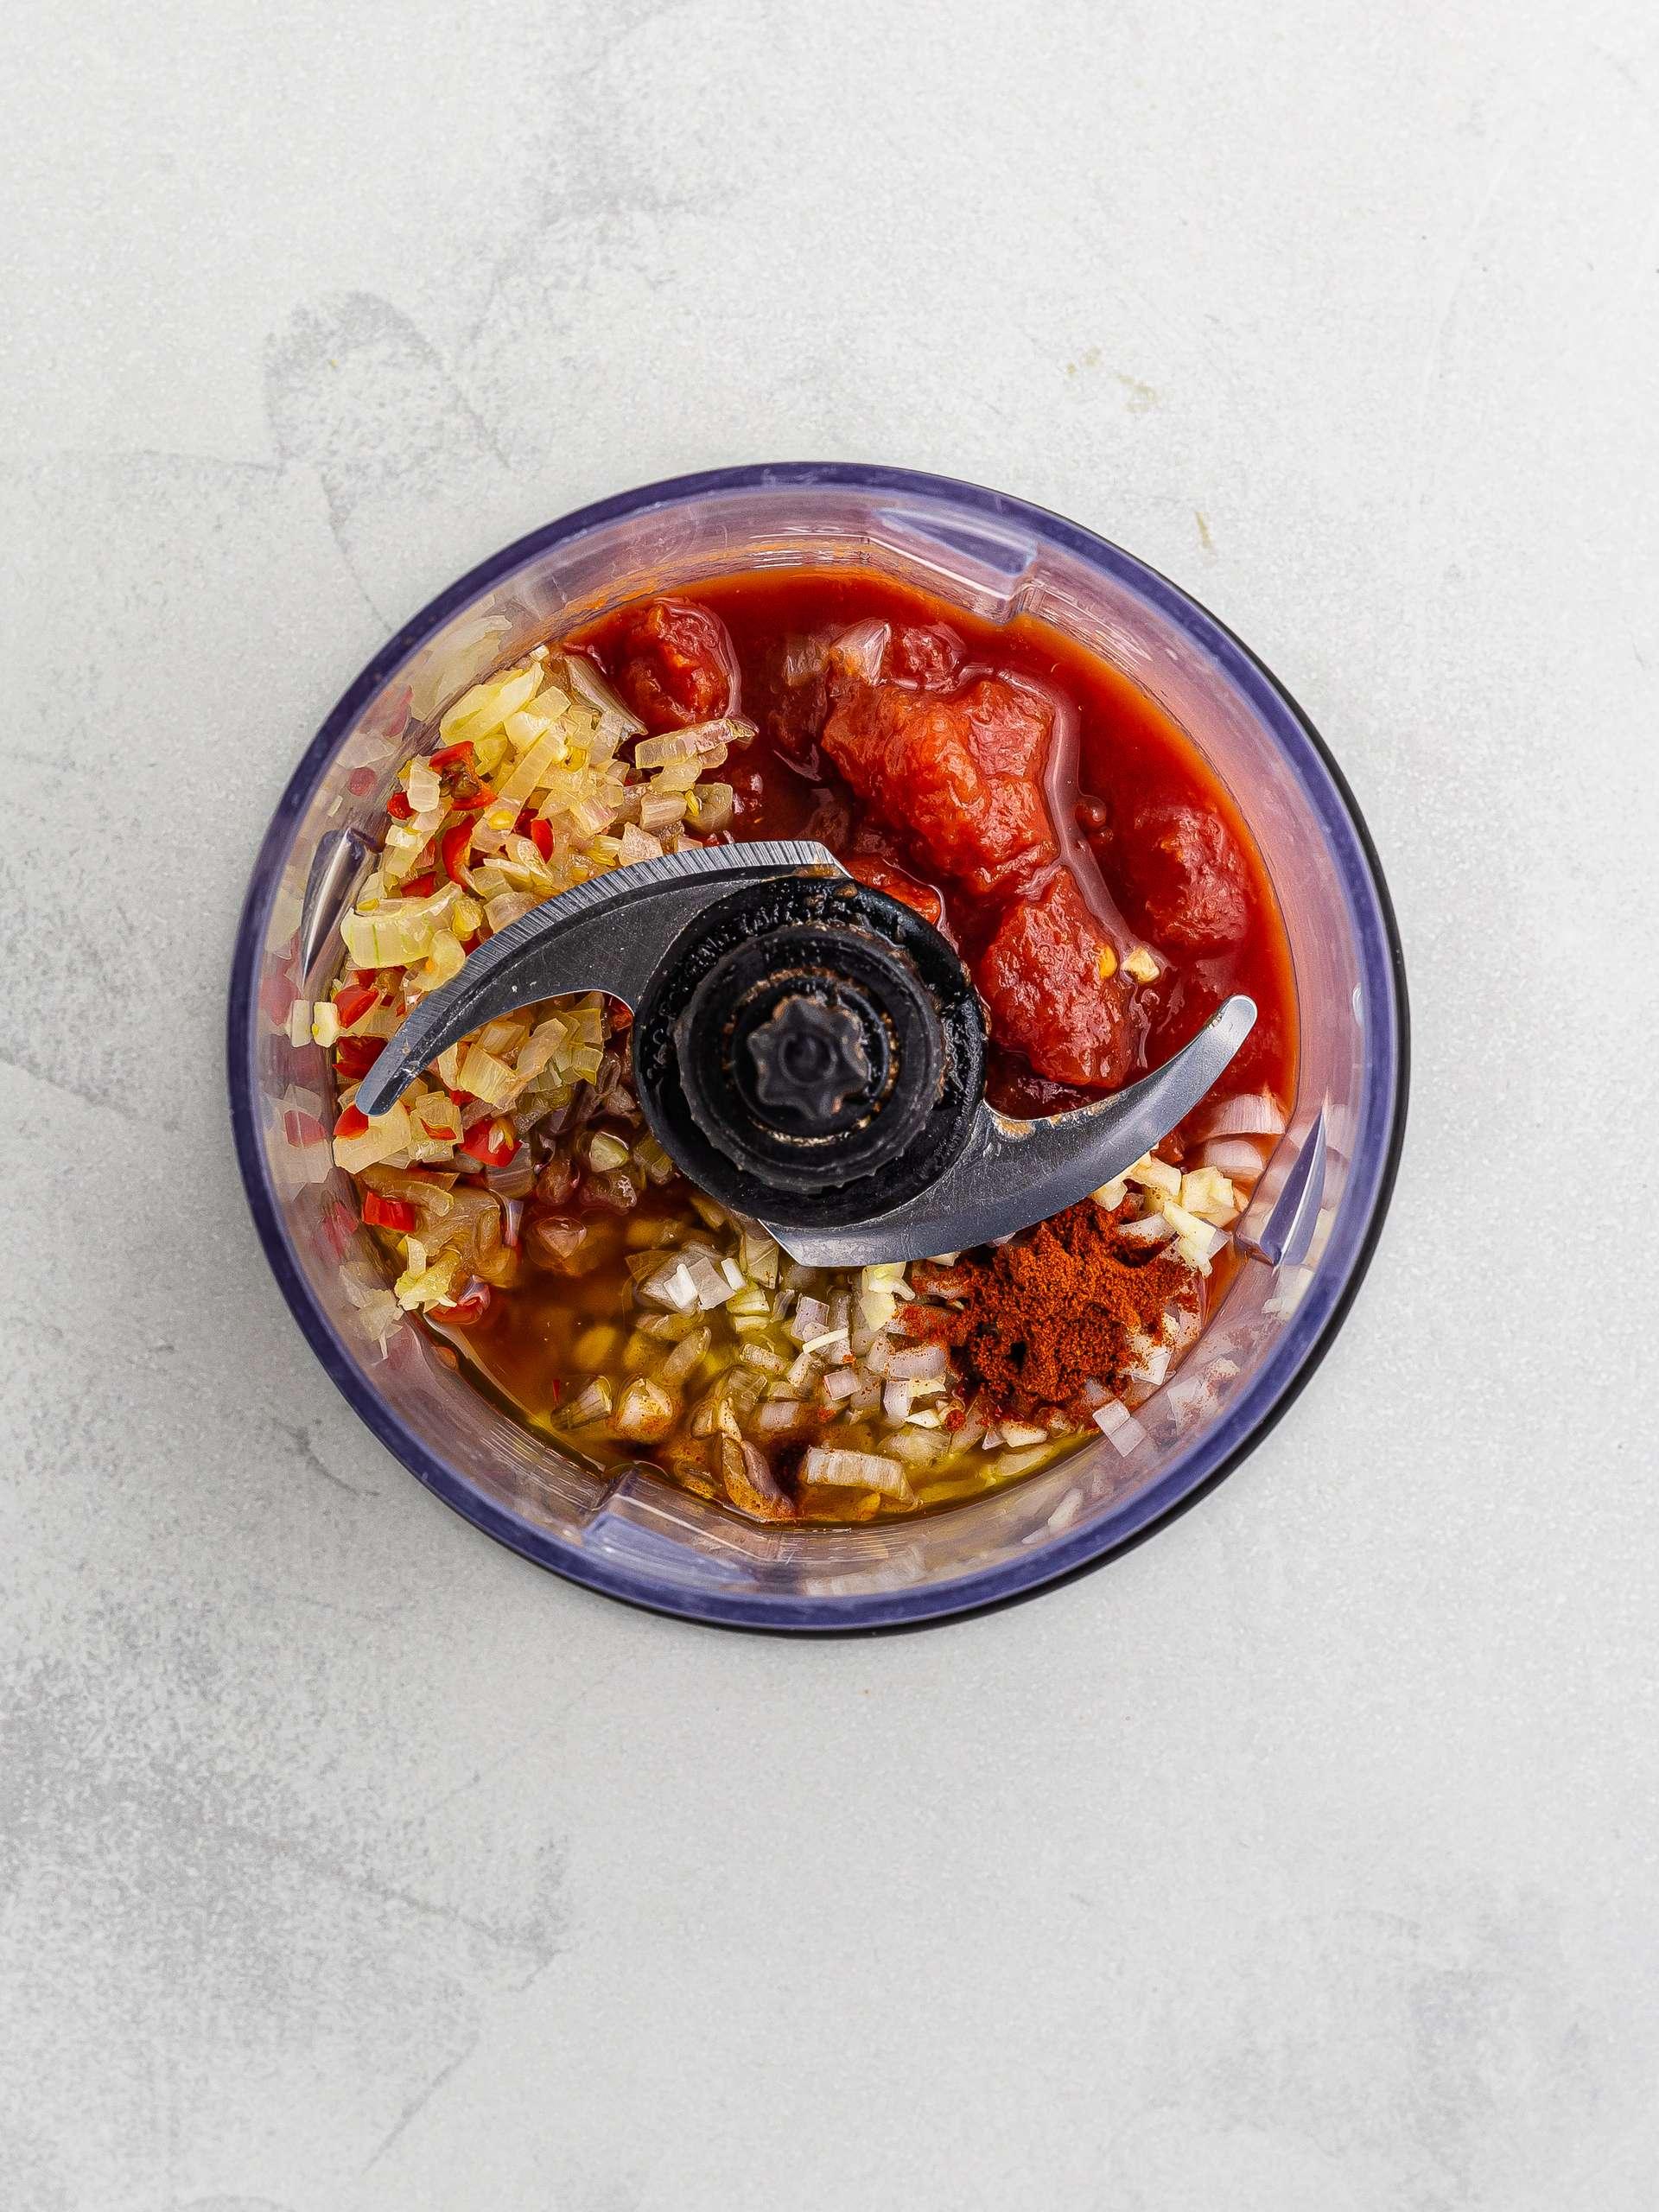 kebab chilli shop sauce ingredients in a blender